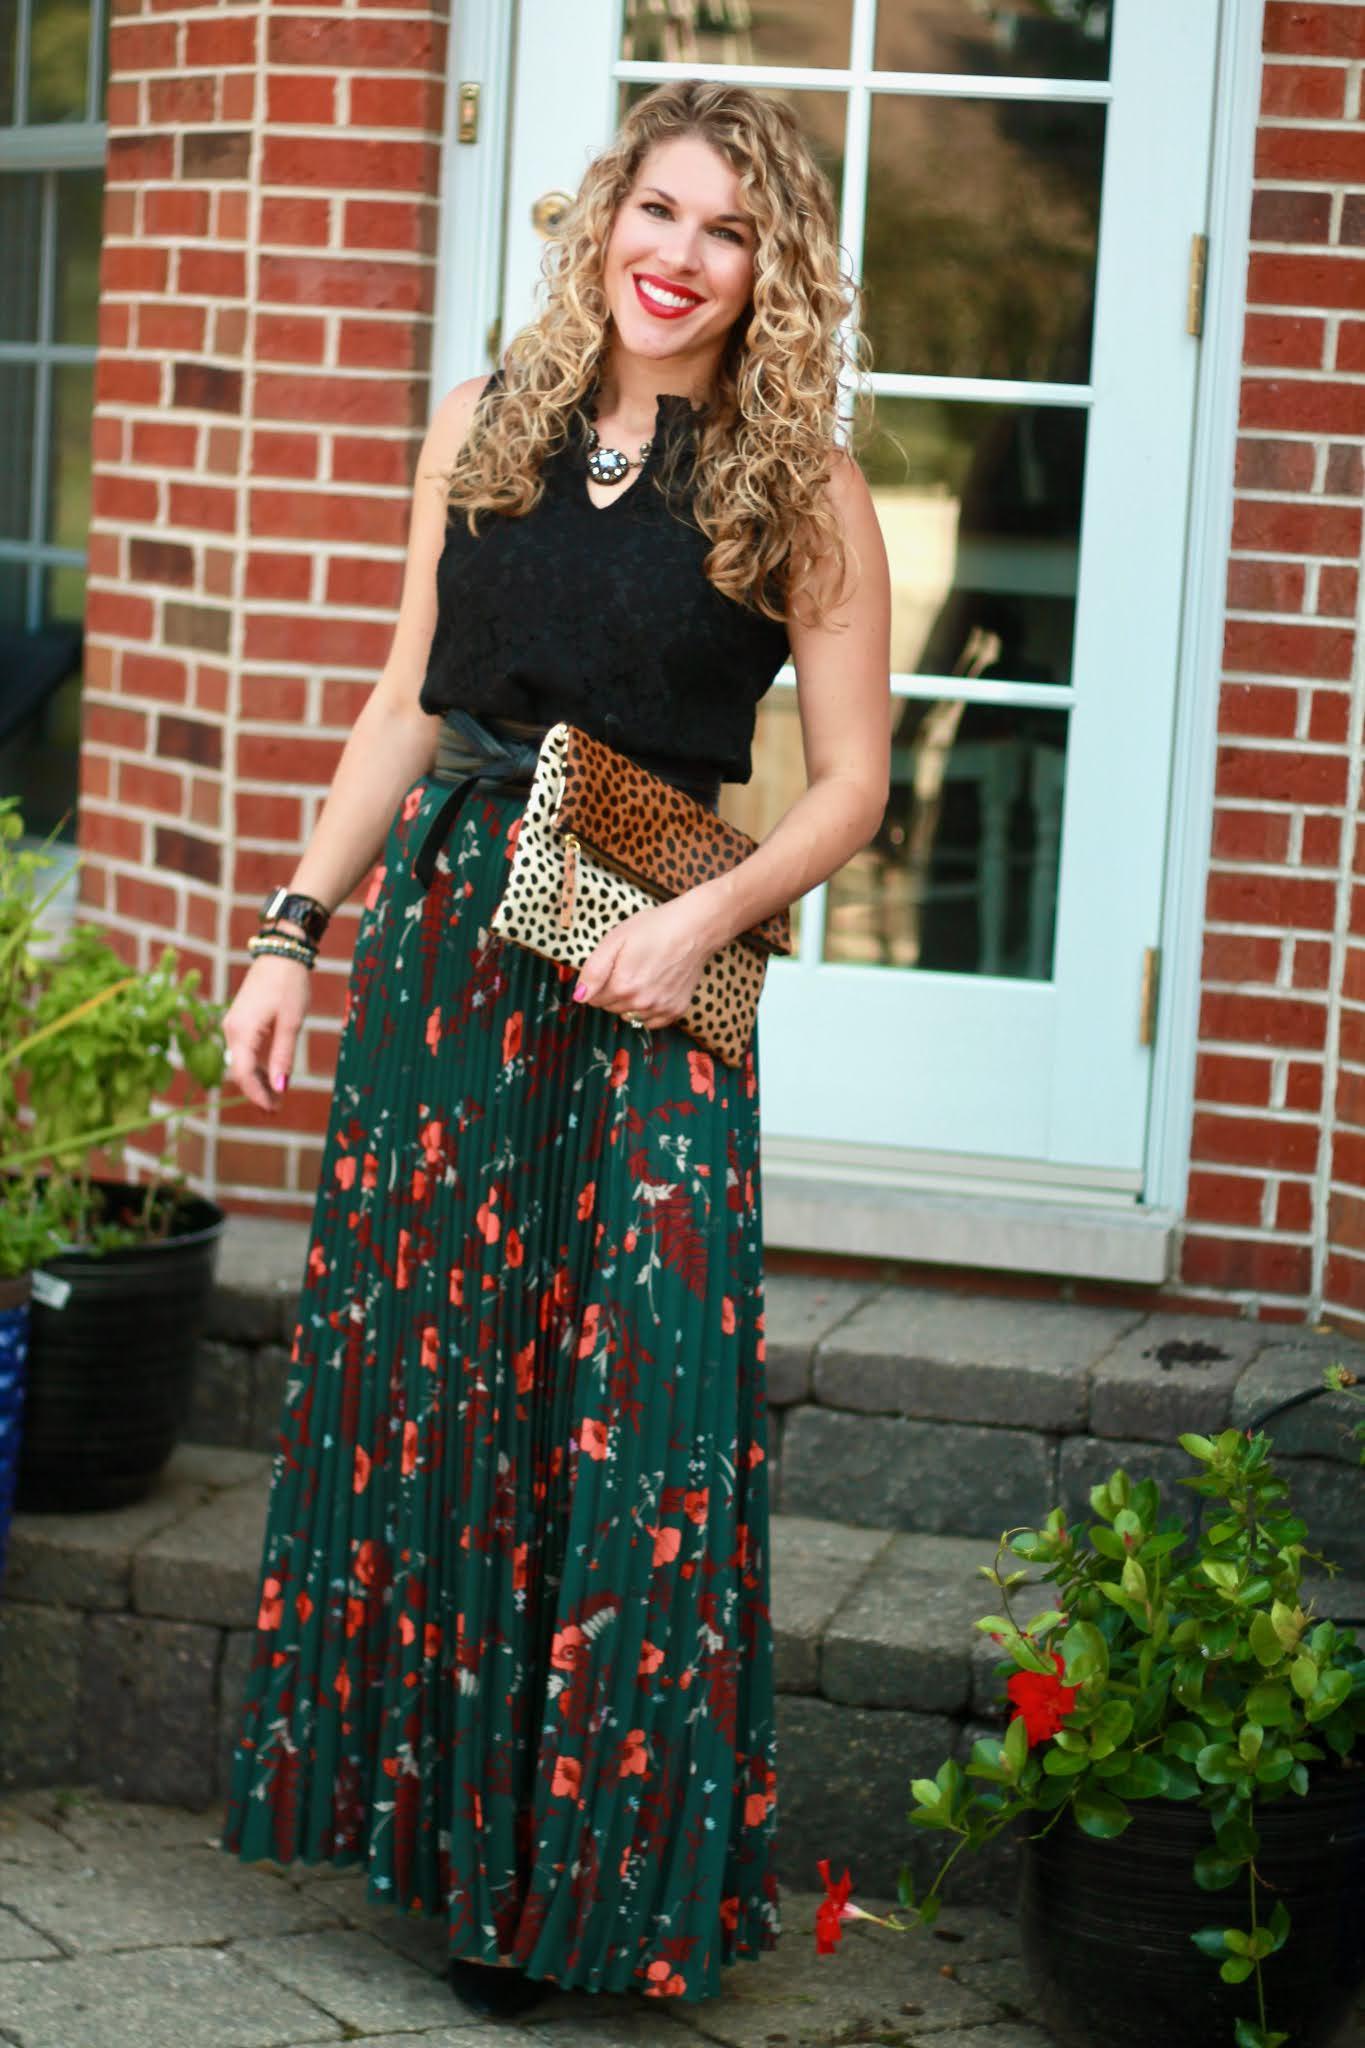 Fall Wedding Guest Outfit Inspiration, green floral maxi skirt, obi belt, black lace blouse, leopard clutch